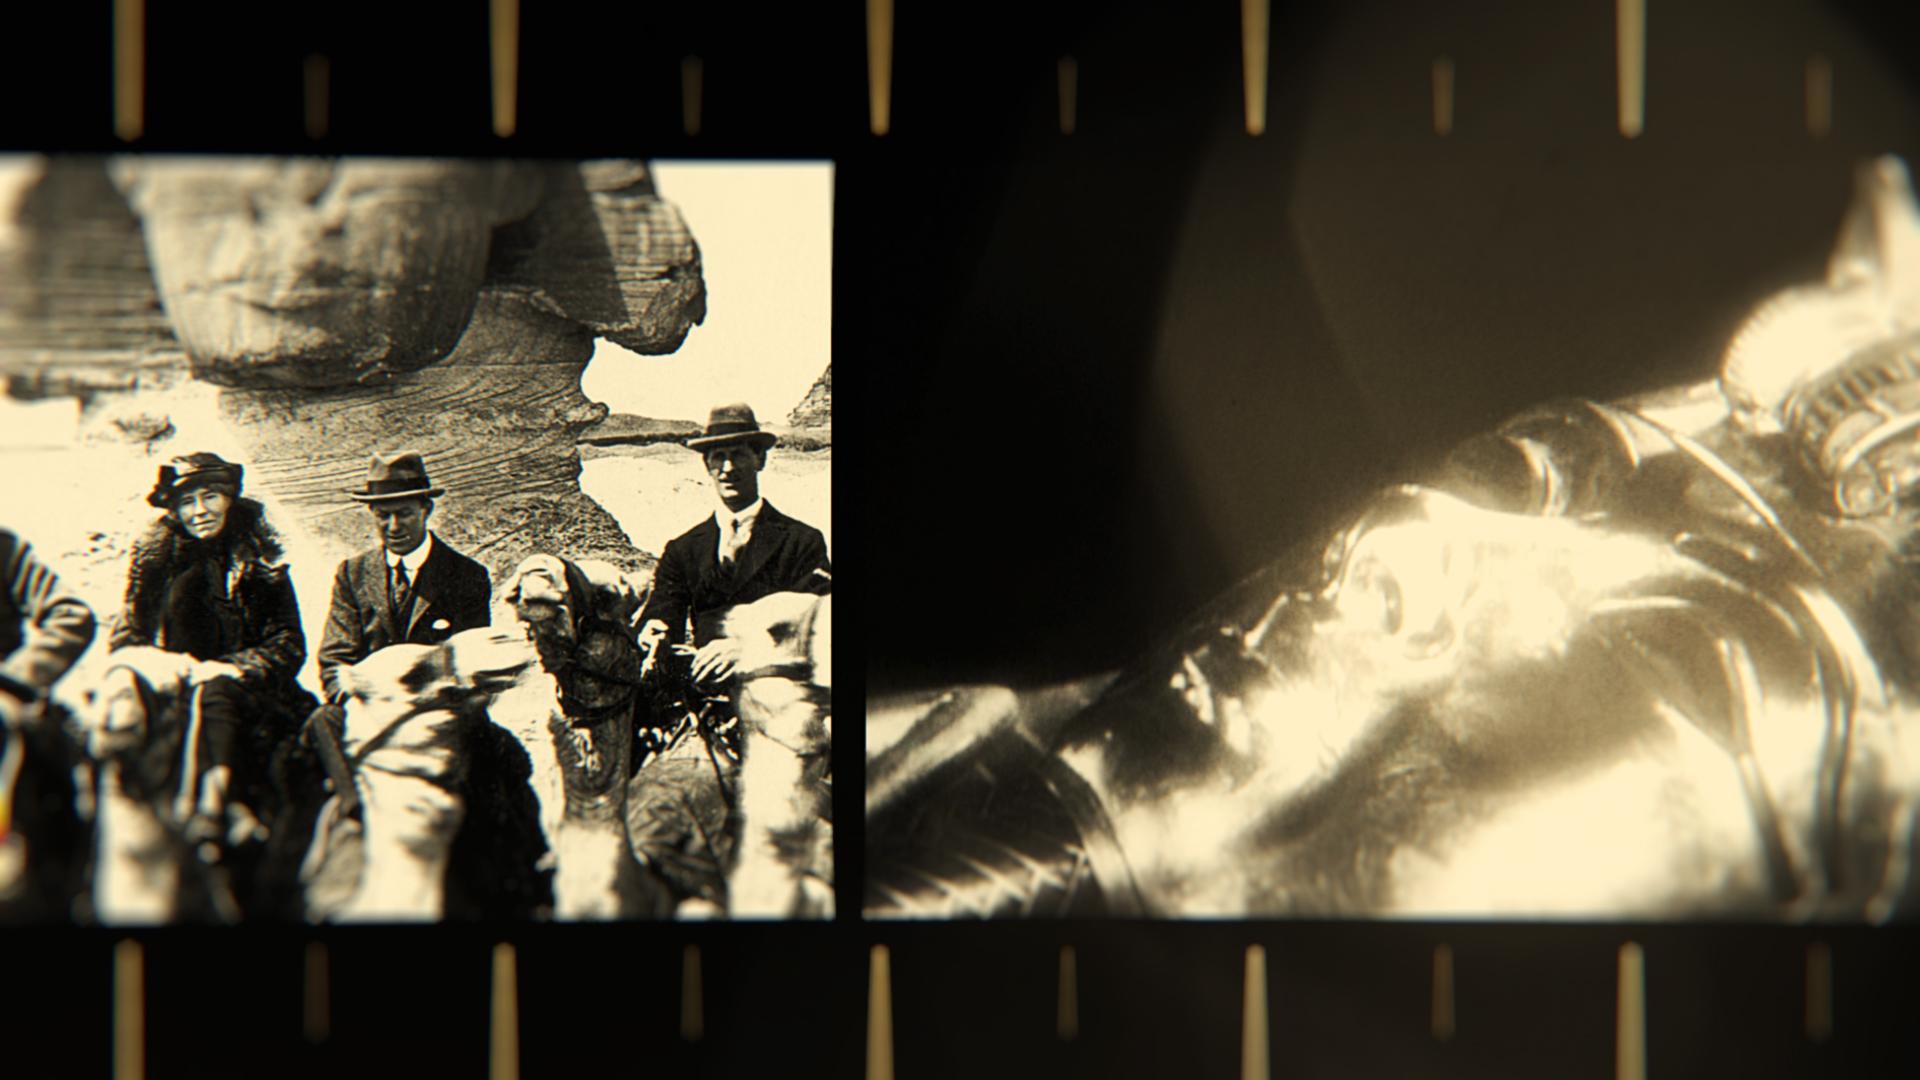 01_EXP_TL_01_1928-1949_FINAL_ProRes4444 (10-17-33-03).jpg